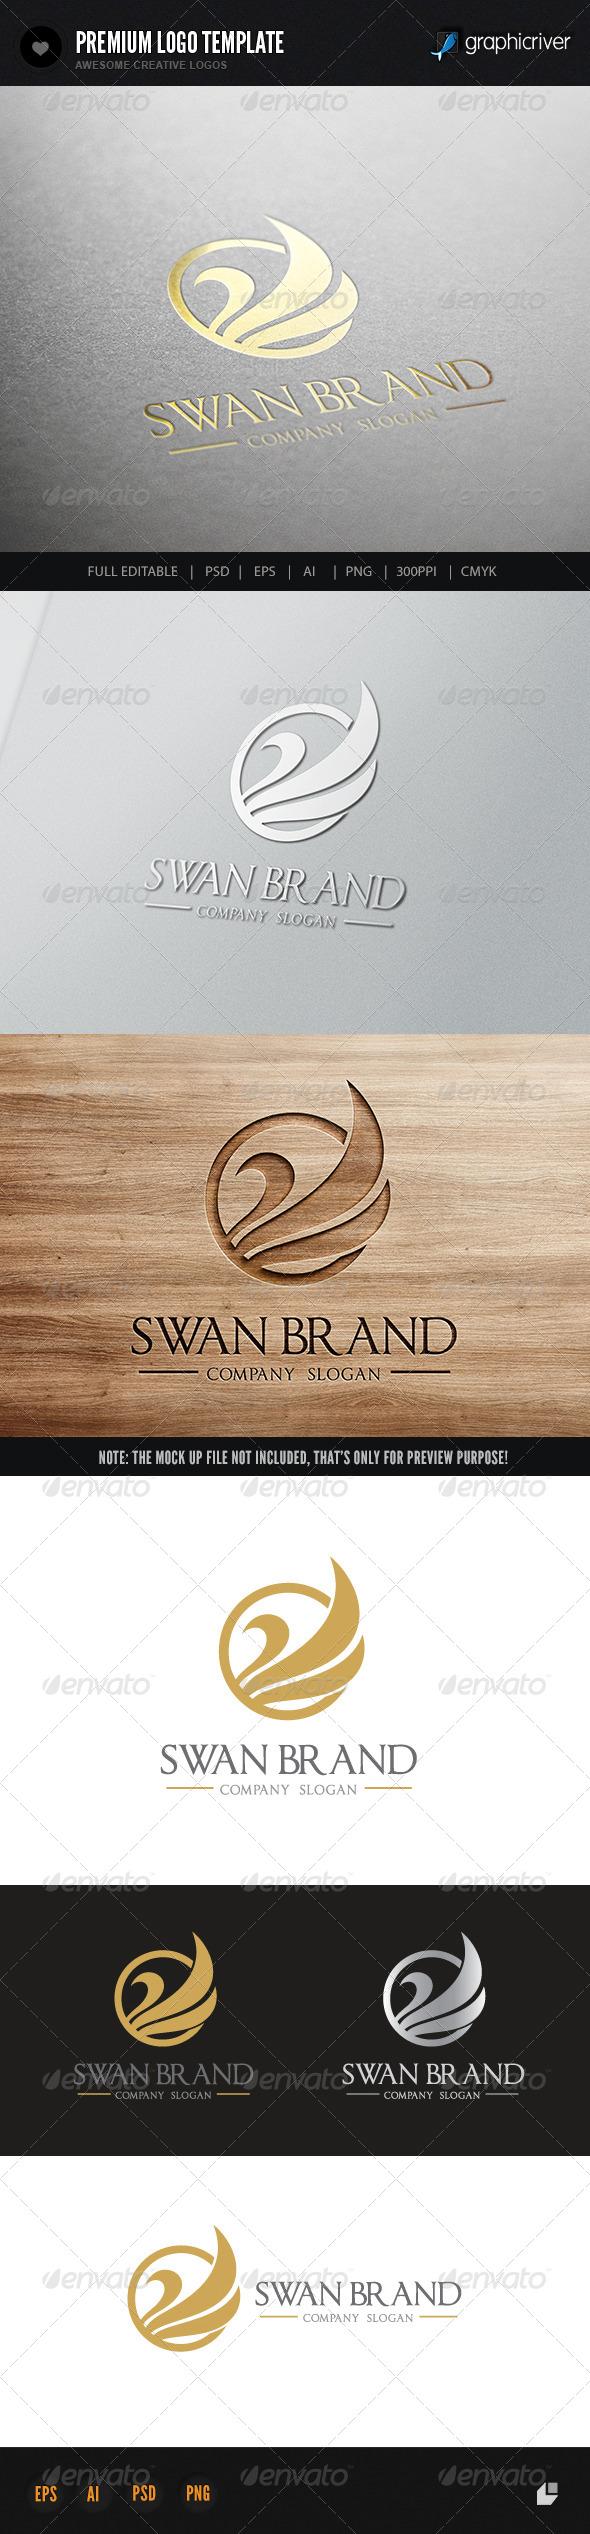 Swan Brand